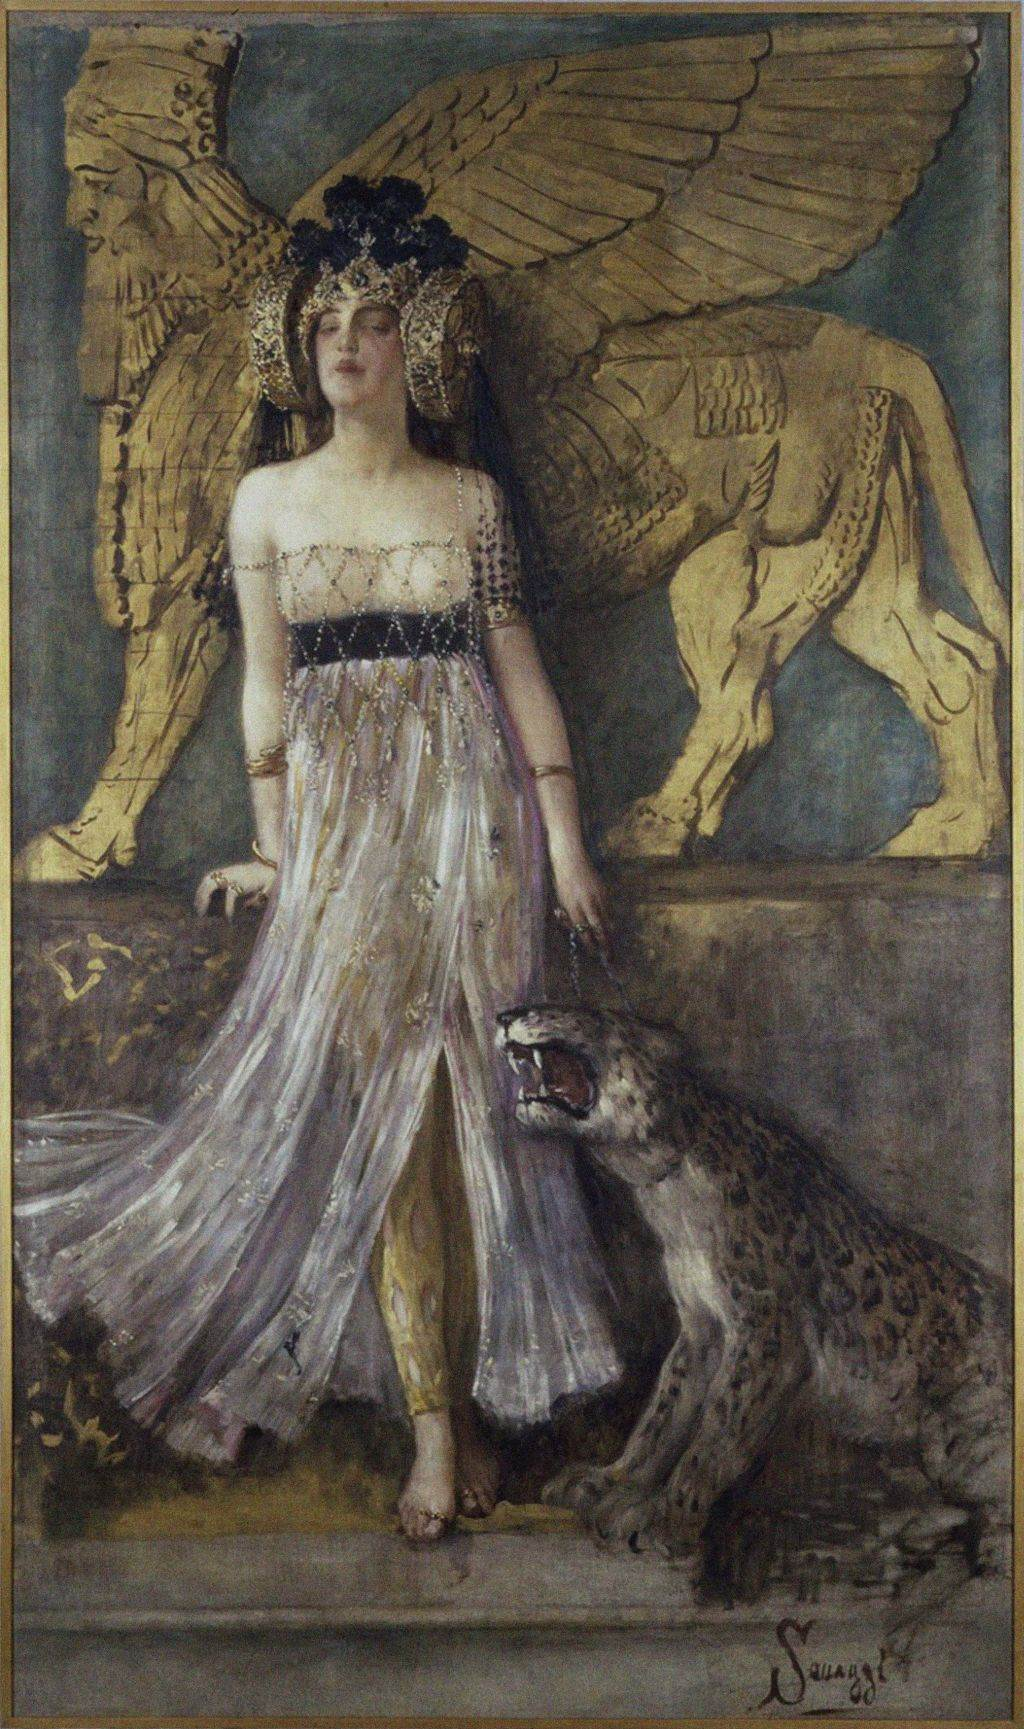 Kraljica Semiramida, 1905, delo slikara Čezara Sakađija iz Tortone